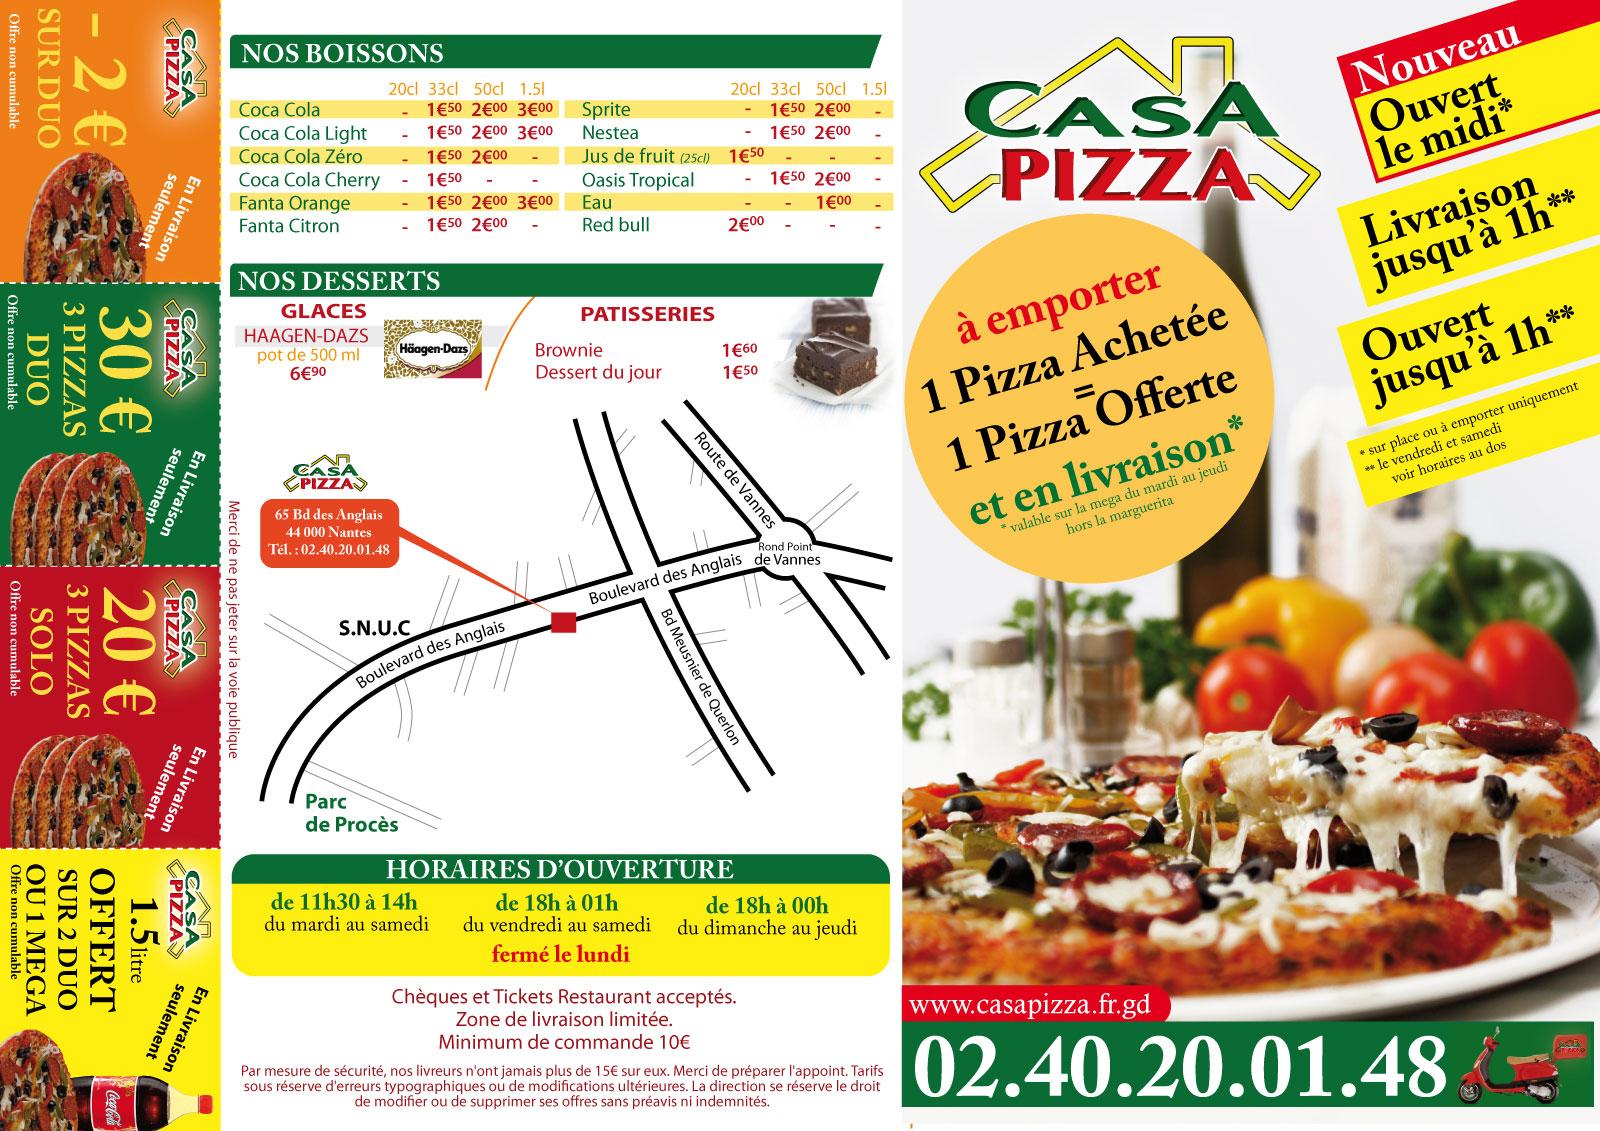 CASA PIZZA - Notre carte